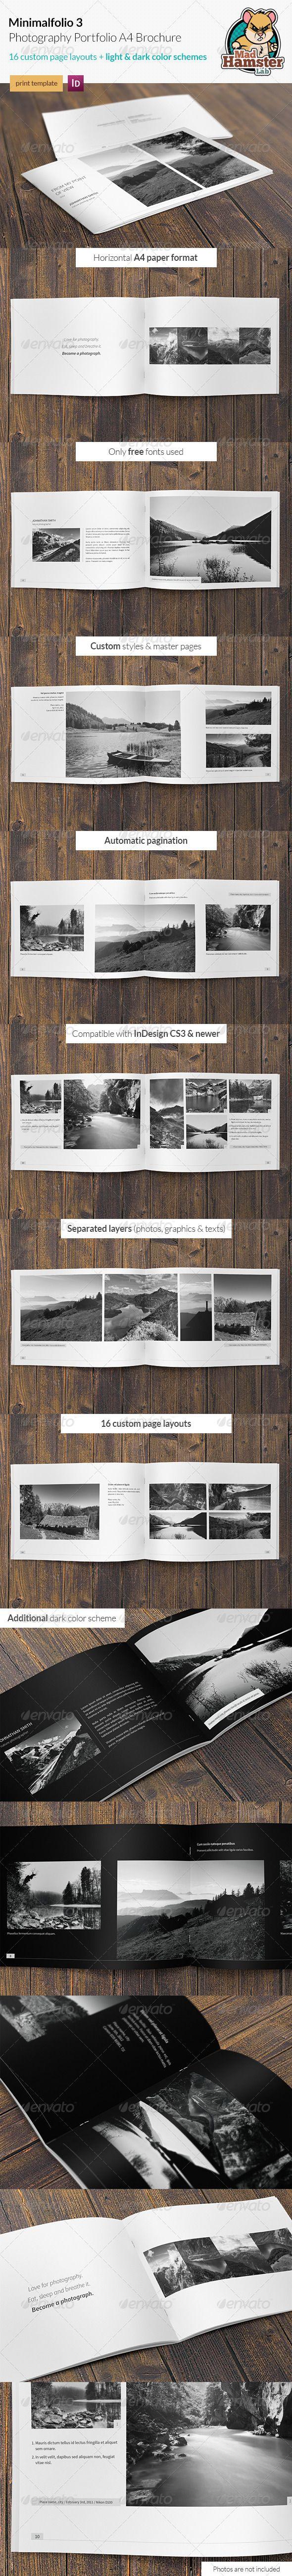 Minimalfolio 3 Photography Portfolio A4 Brochure - Portfolio Brochures